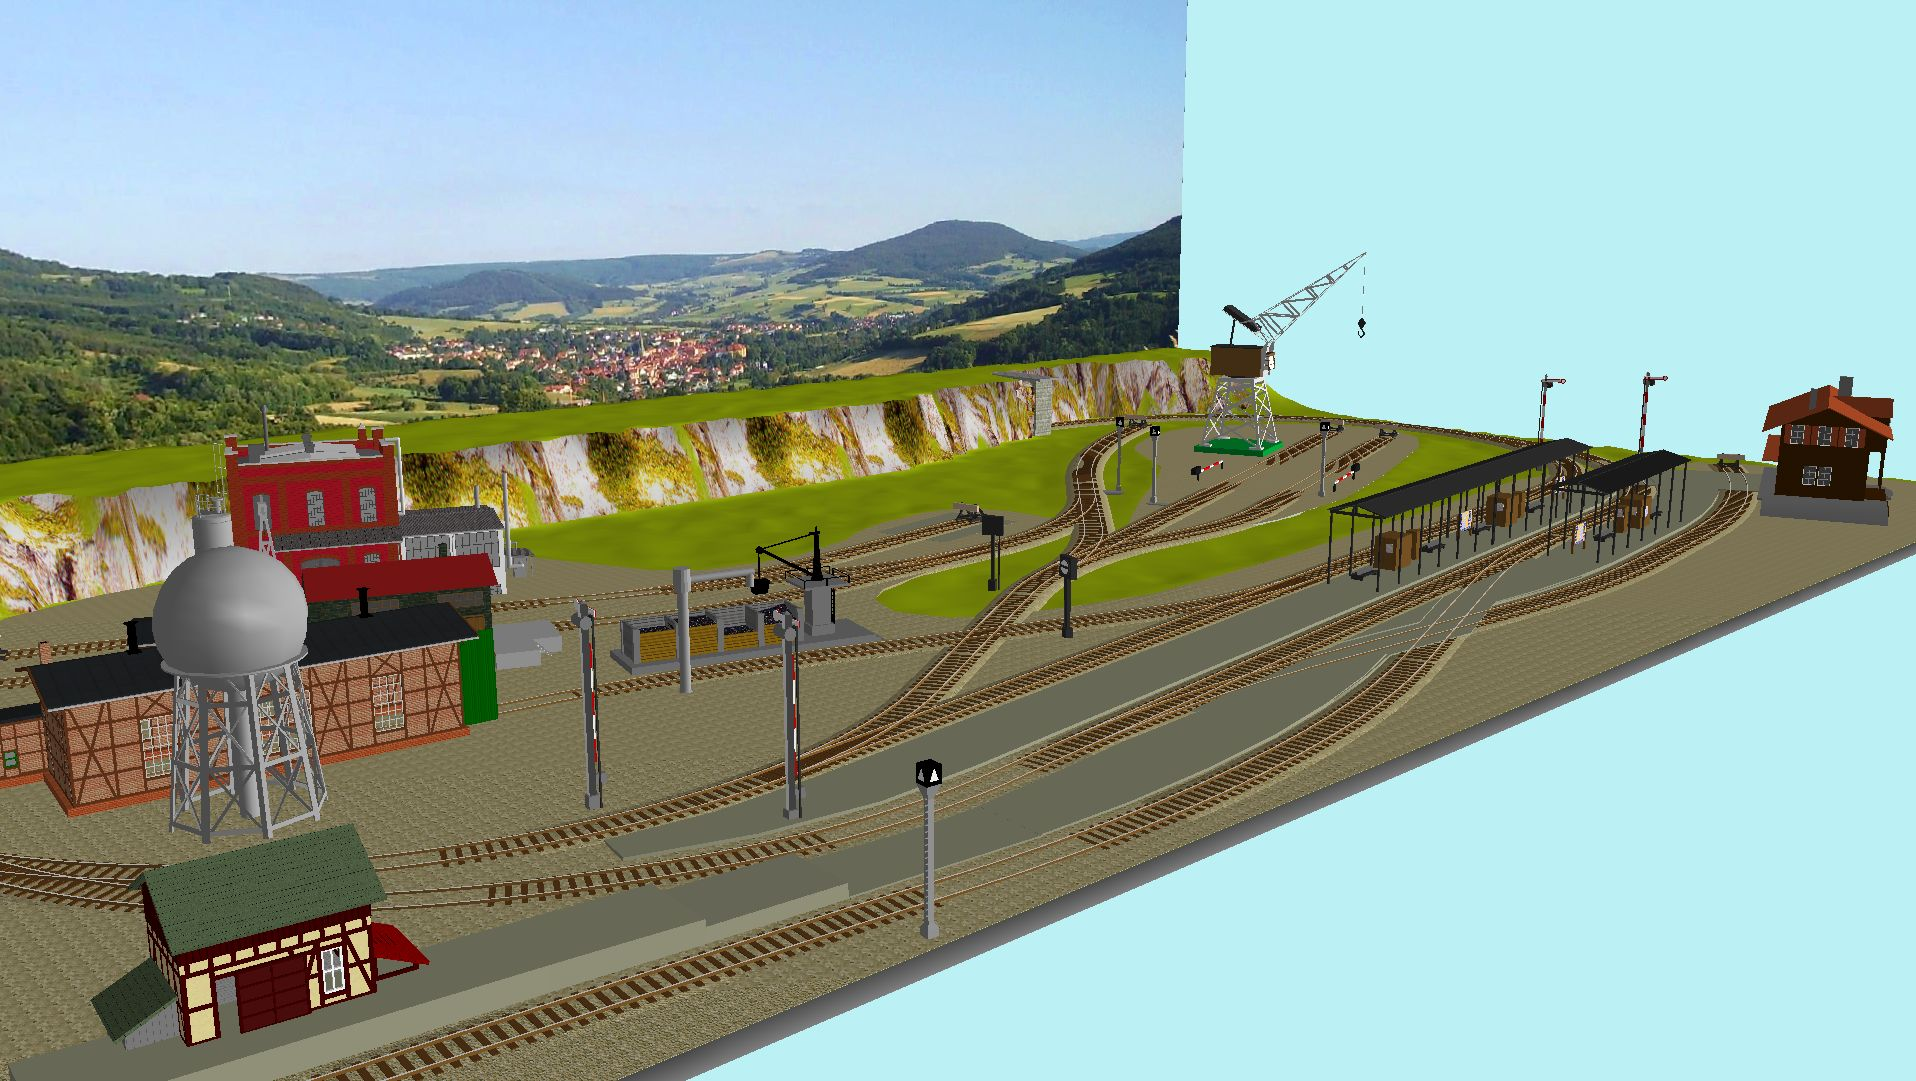 'ALBA Modellbahnpraxis' Band 1, Plan 5 Amp-1_5_c-gleis_freil35jdg